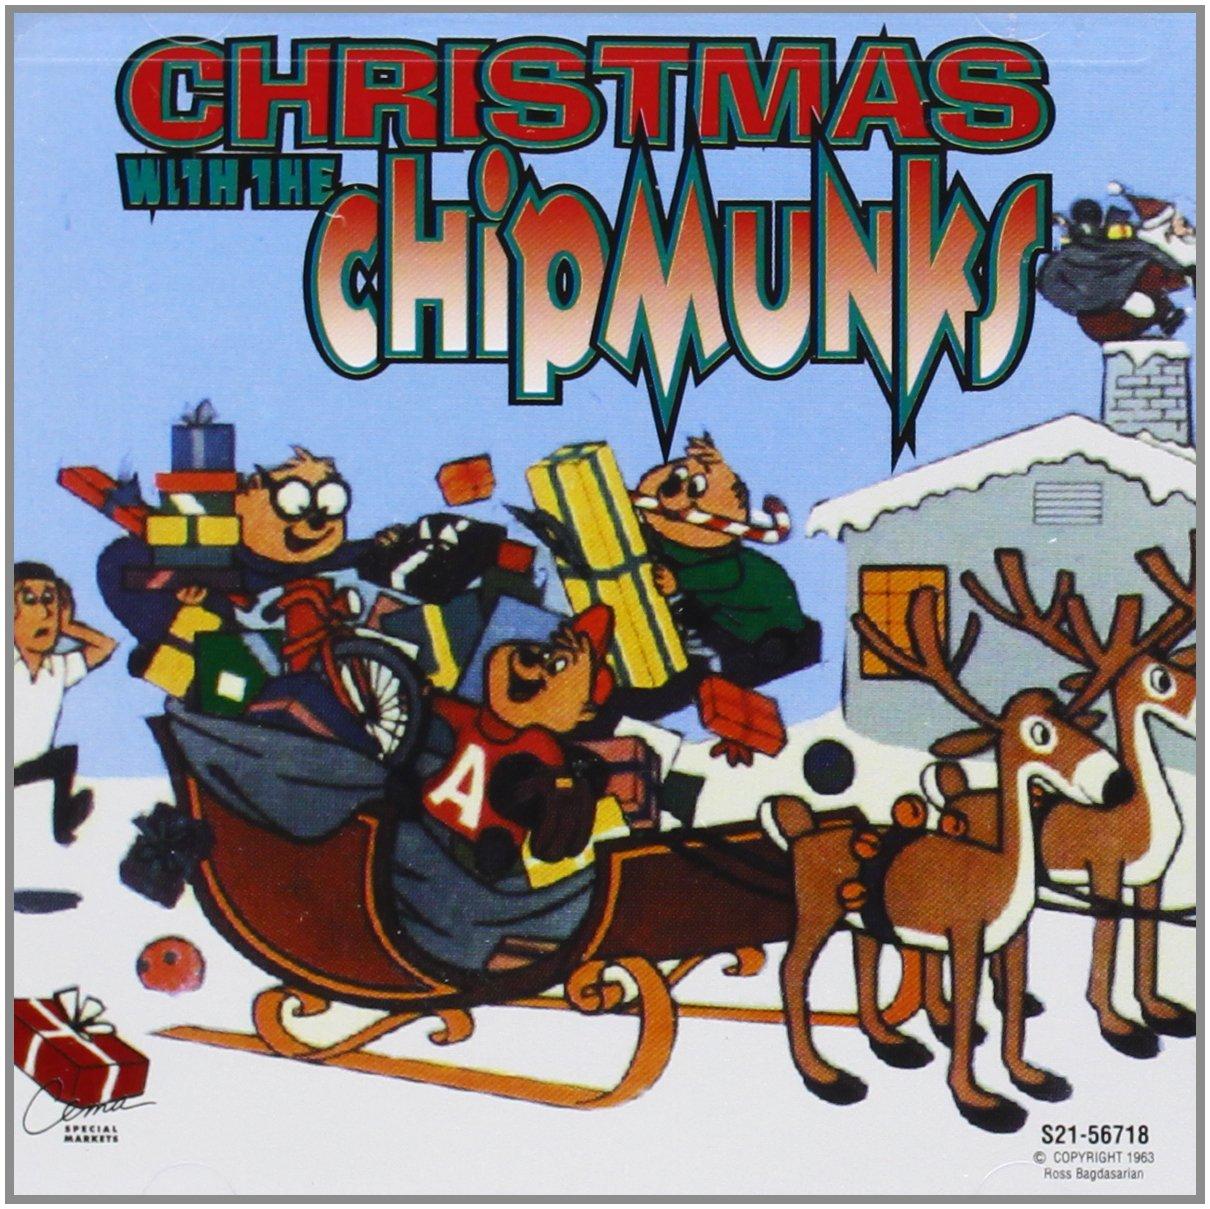 The Chipmunks - Christmas with the Chipmunks, Vol. 1 - Amazon.com ...